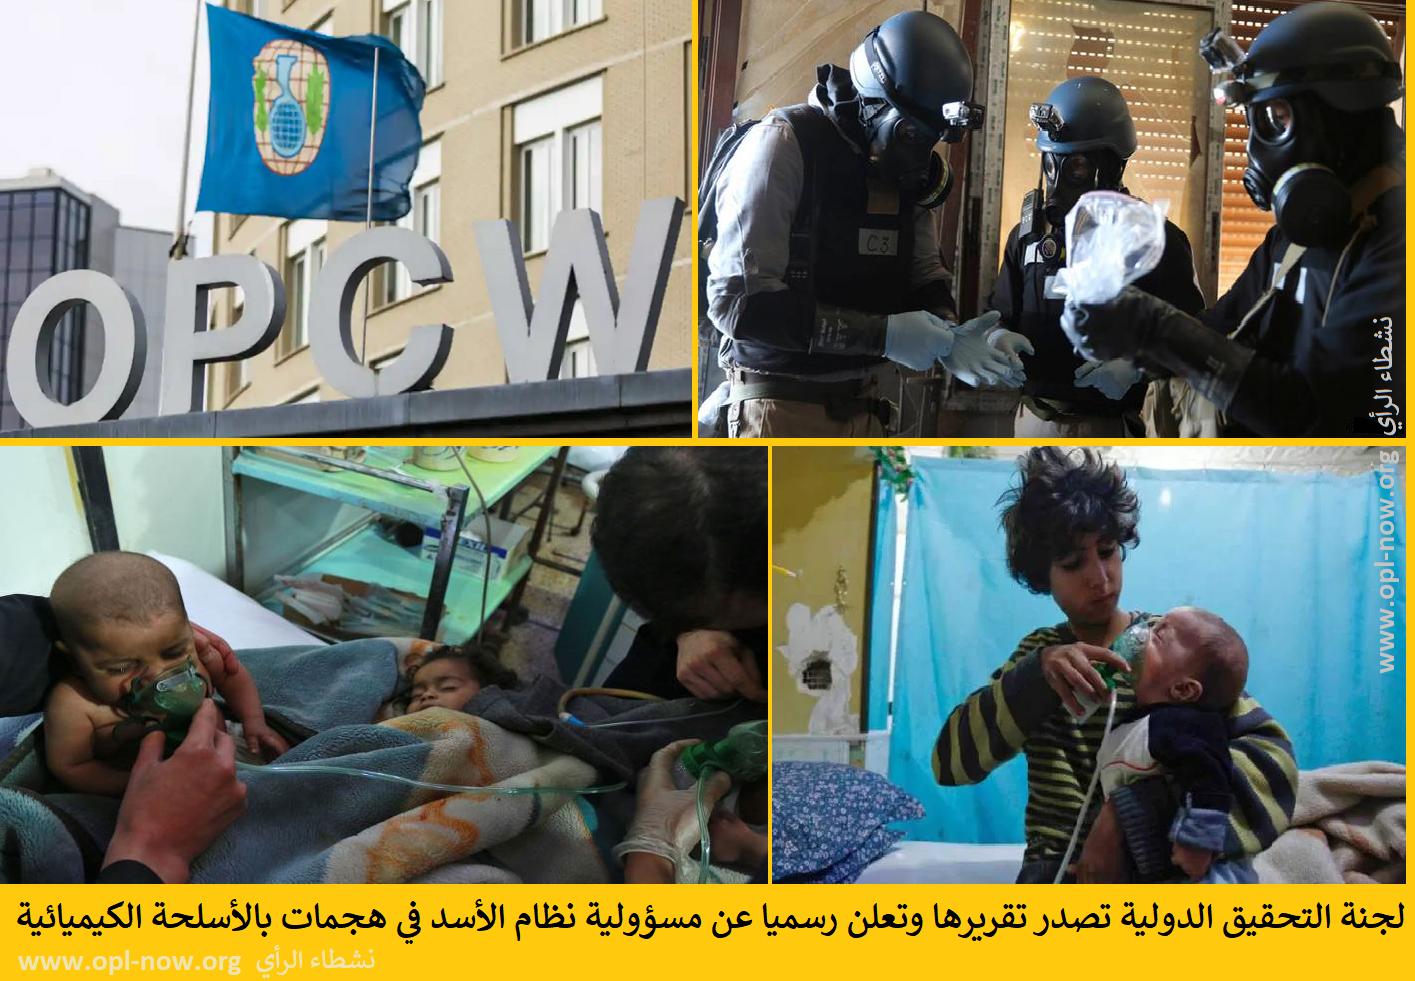 Photo of لجنة التحقيق الدولية تصدر تقريرها وتعلن رسميا عن مسؤولية نظام الأسد في هجمات بالأسلحة الكيميائية